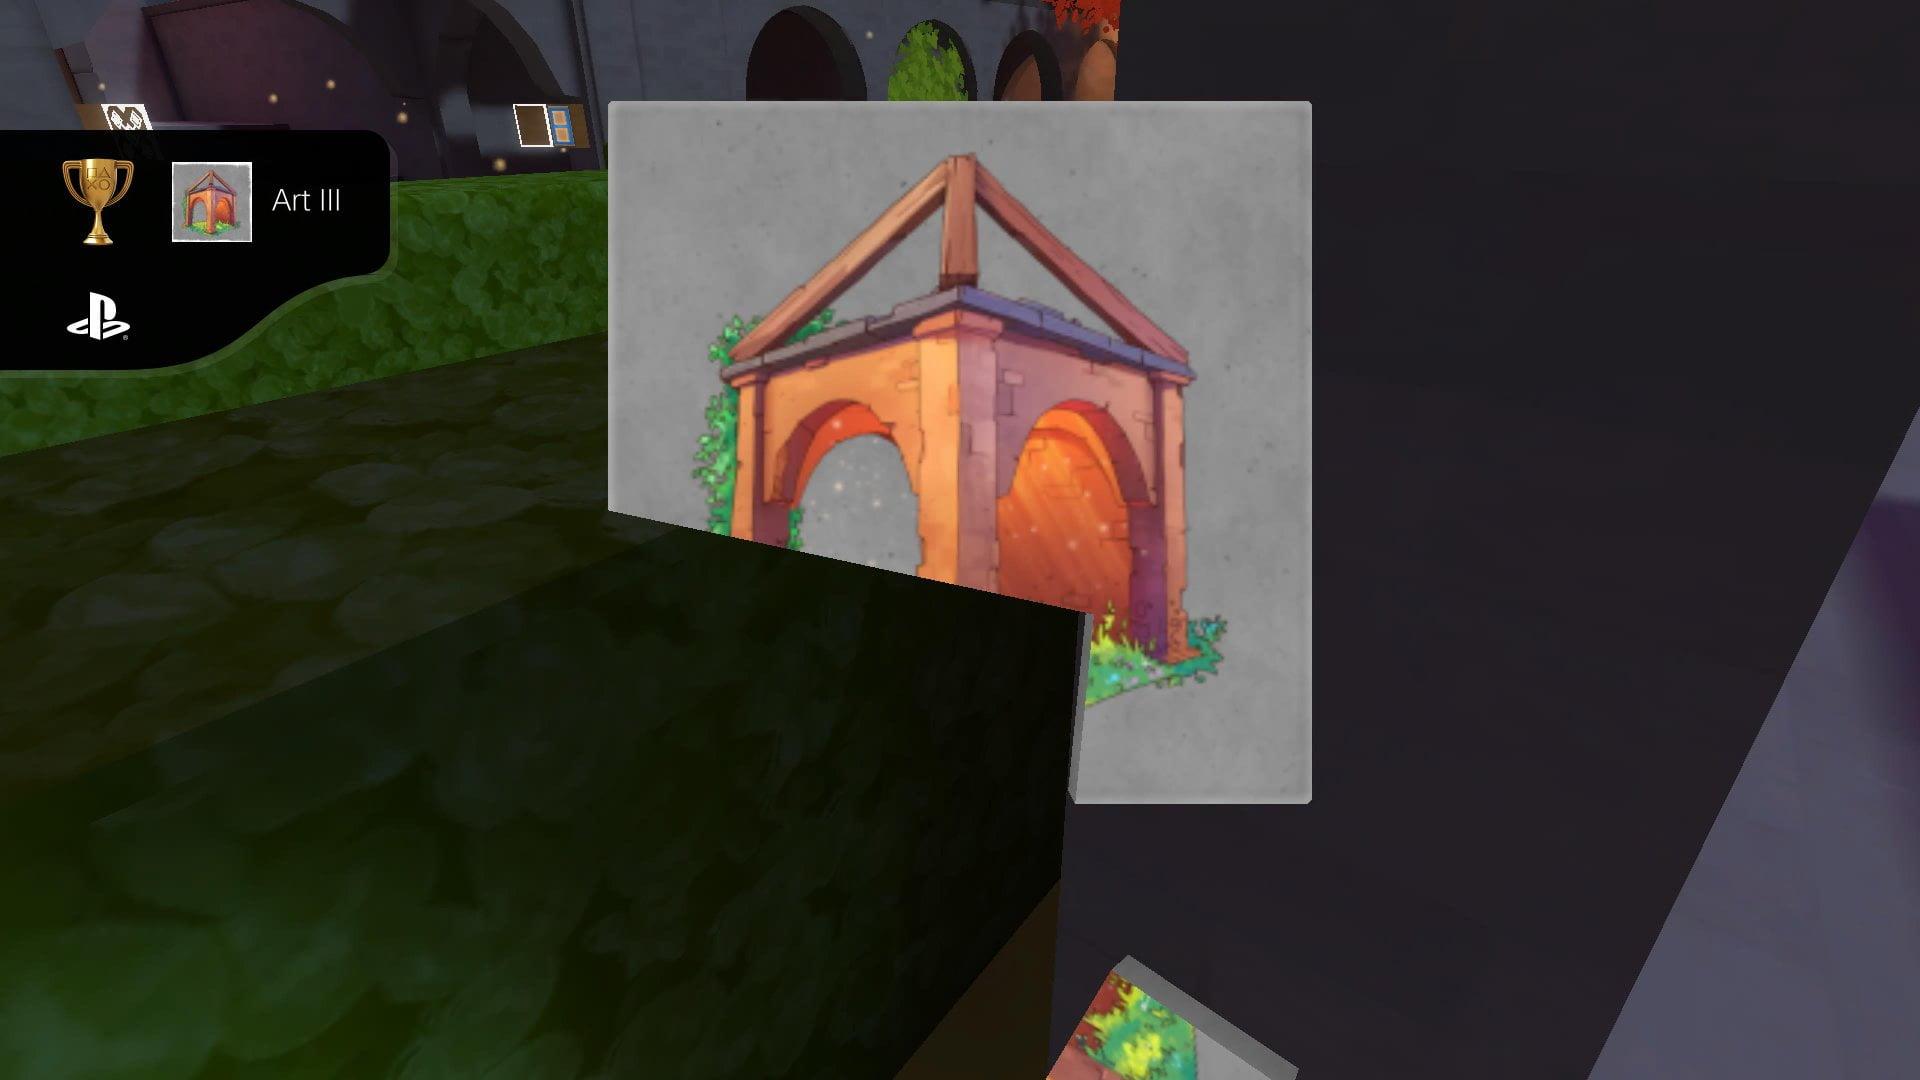 The Pillar 6